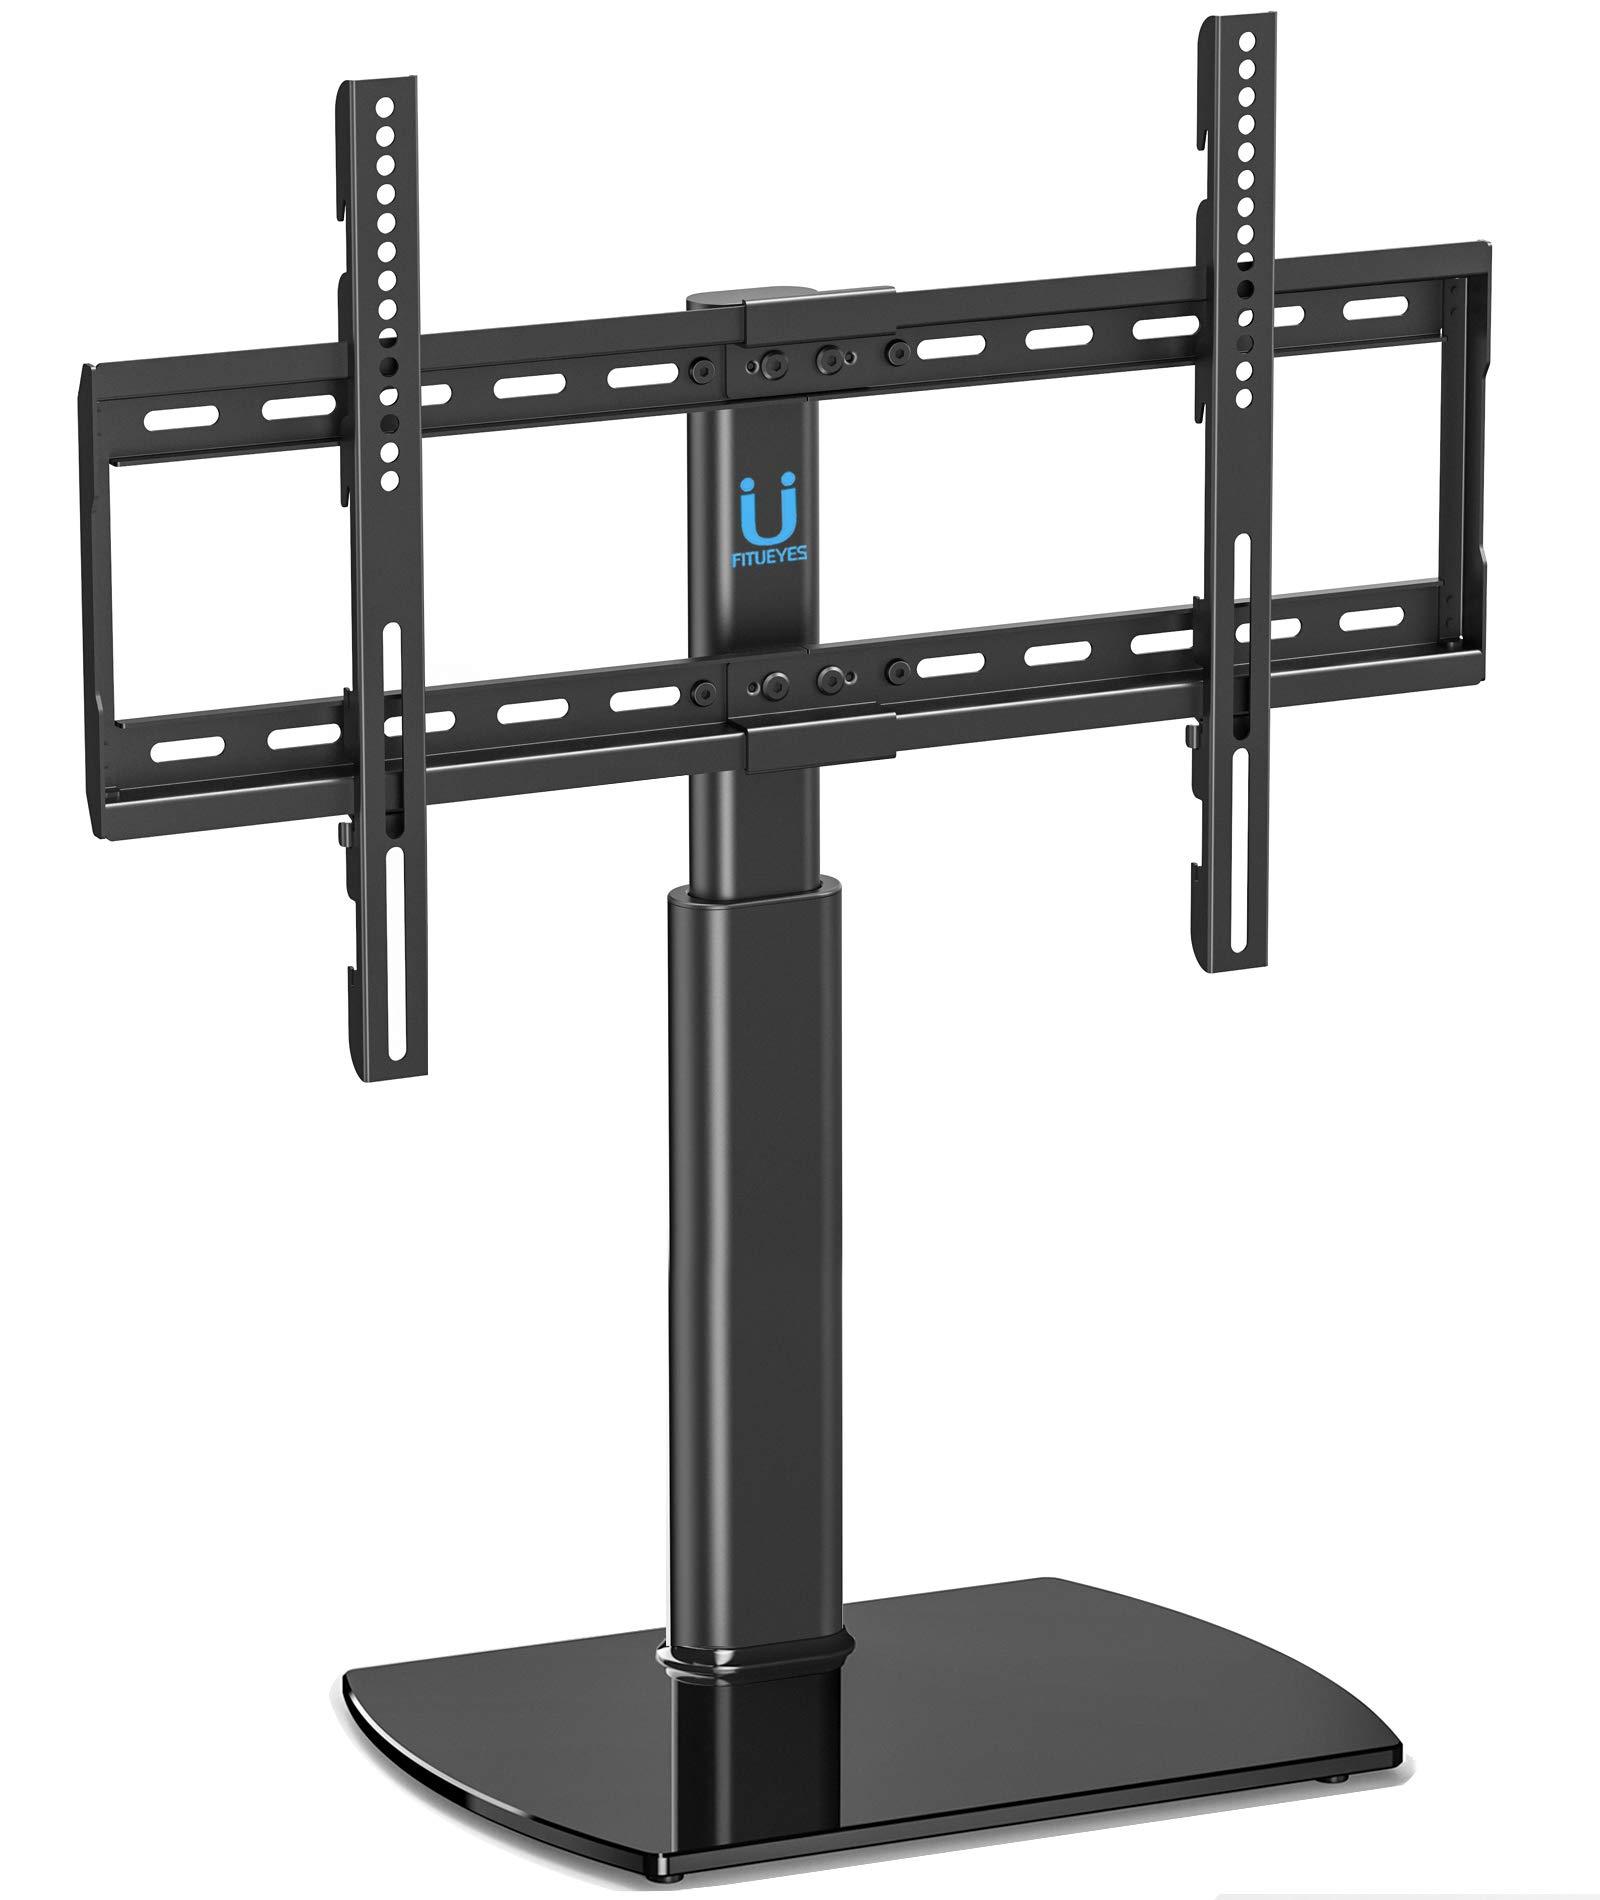 FITUEYES Giratorio Soporte para TV LCD LED OLED Plasma Plano Curvo 32-65 Pulgadas TT107002GB